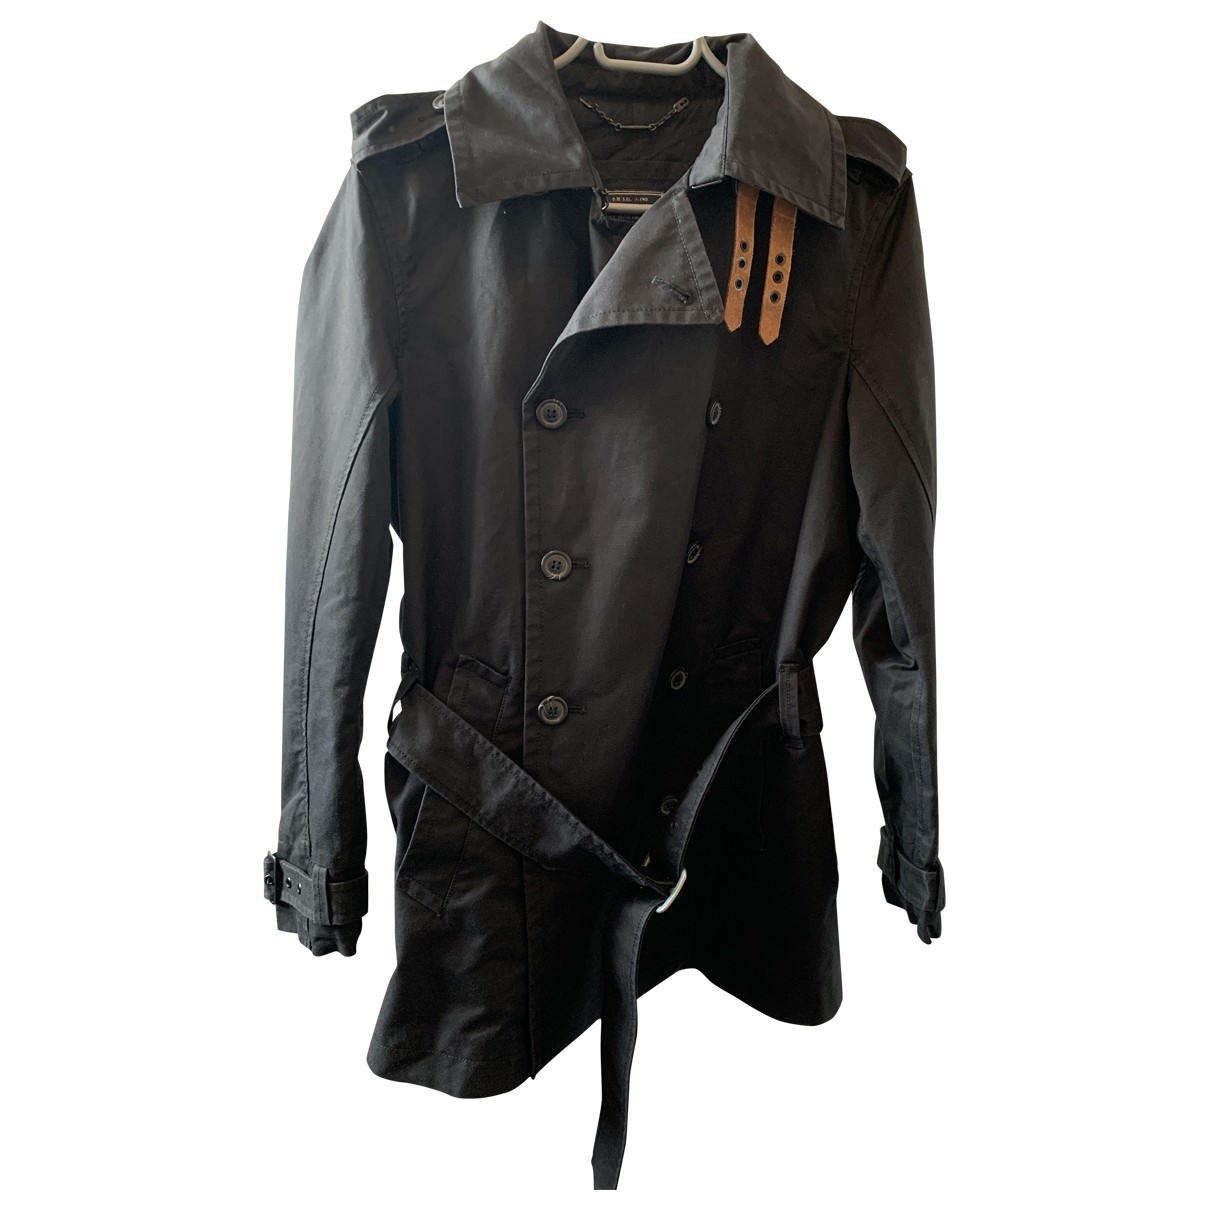 Diesel \N Black Denim - Jeans jacket  for Men S International